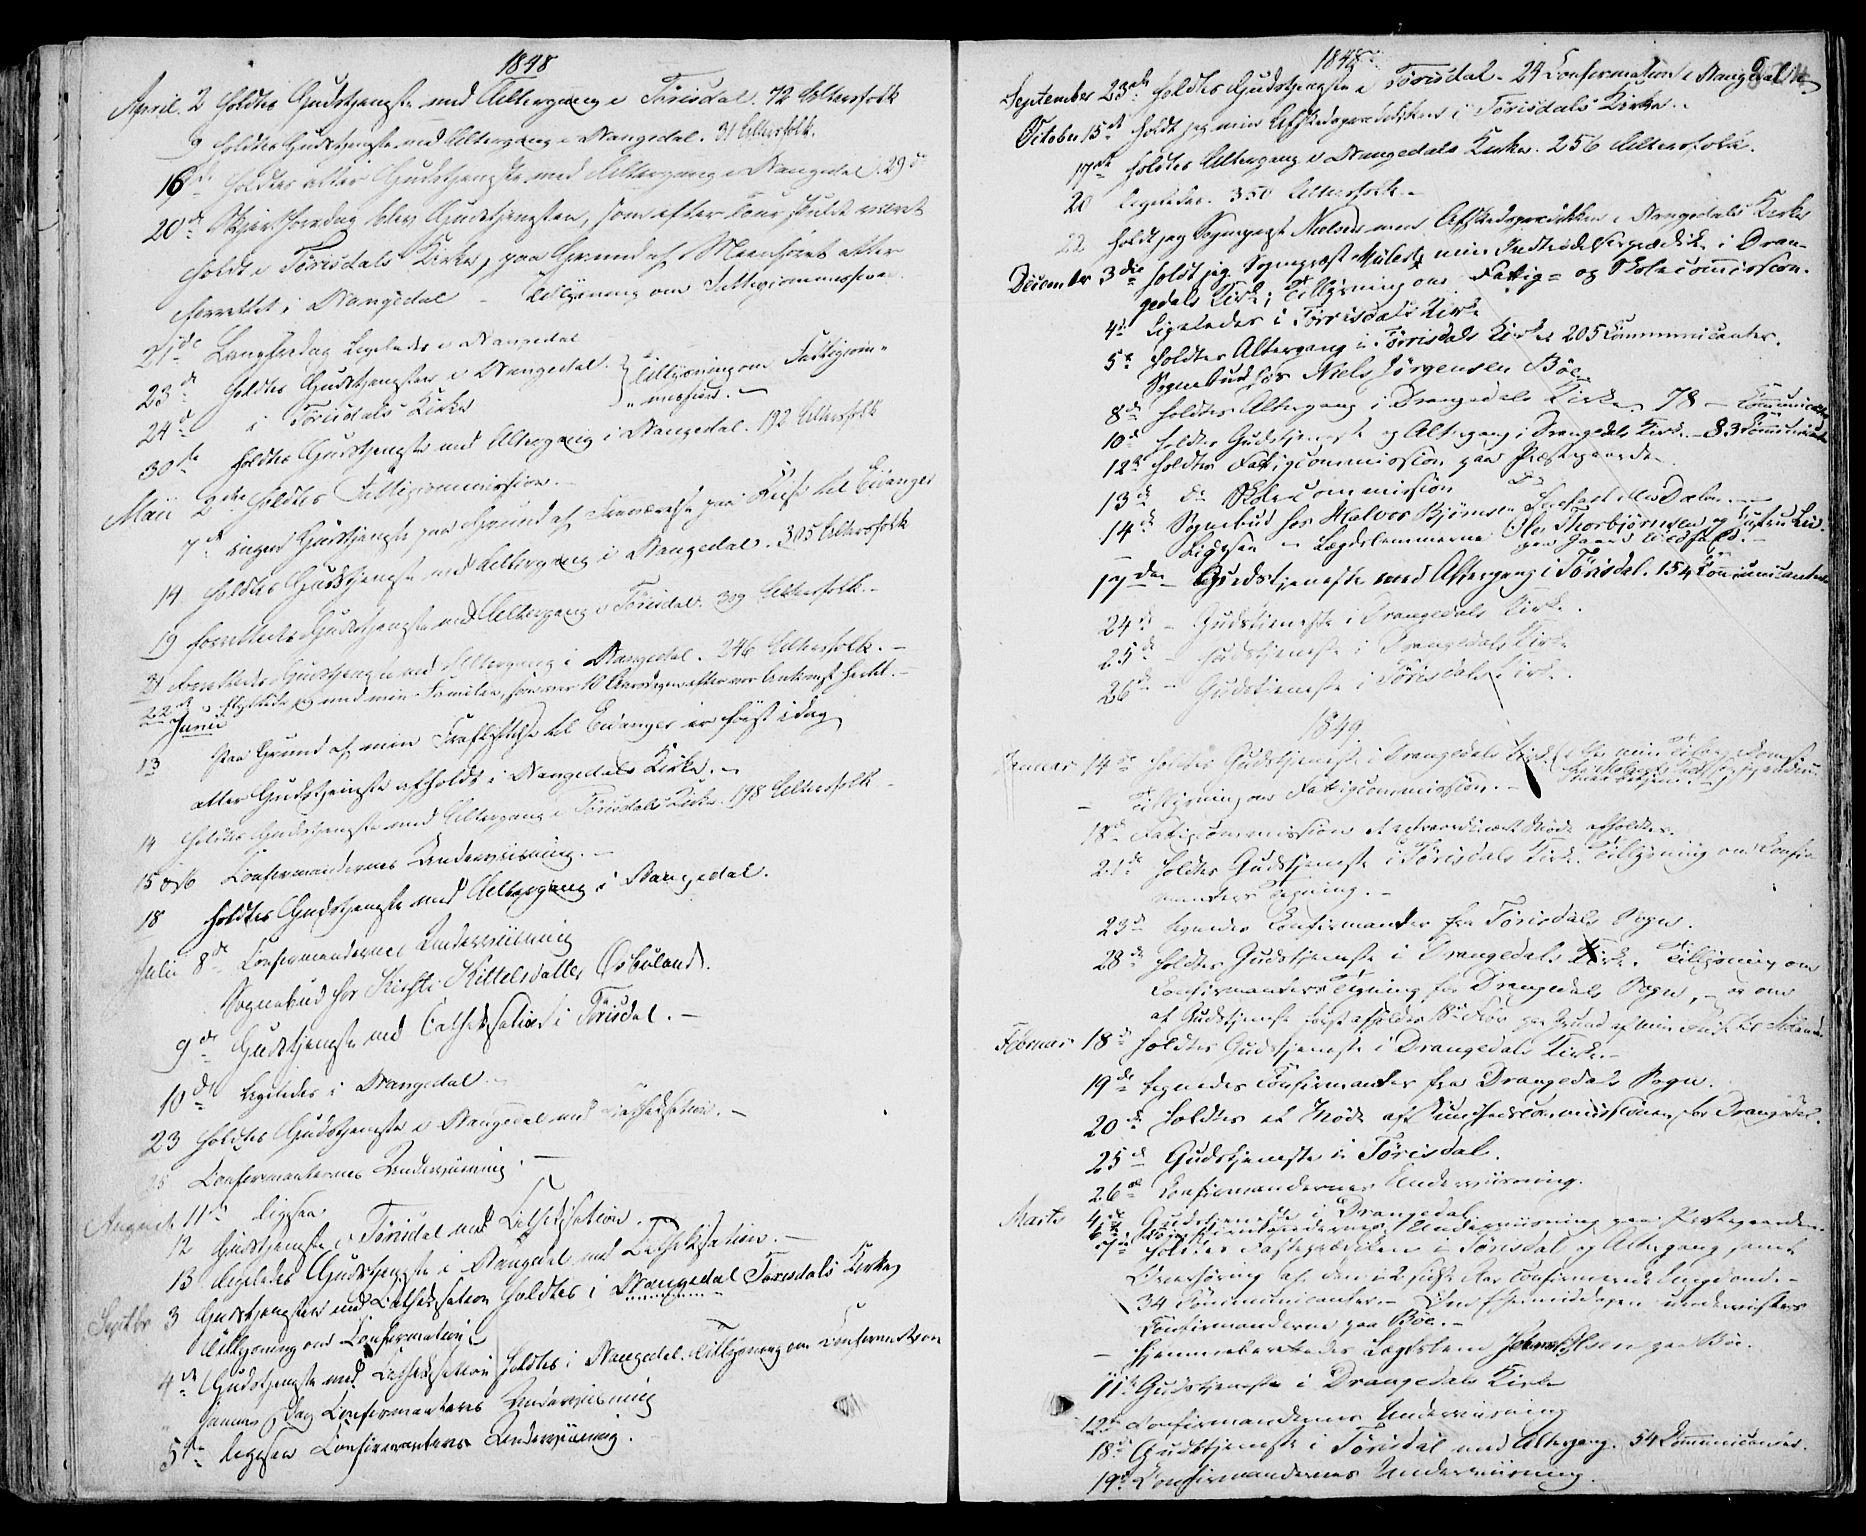 SAKO, Drangedal kirkebøker, F/Fa/L0007b: Ministerialbok nr. 7b, 1837-1856, s. 824